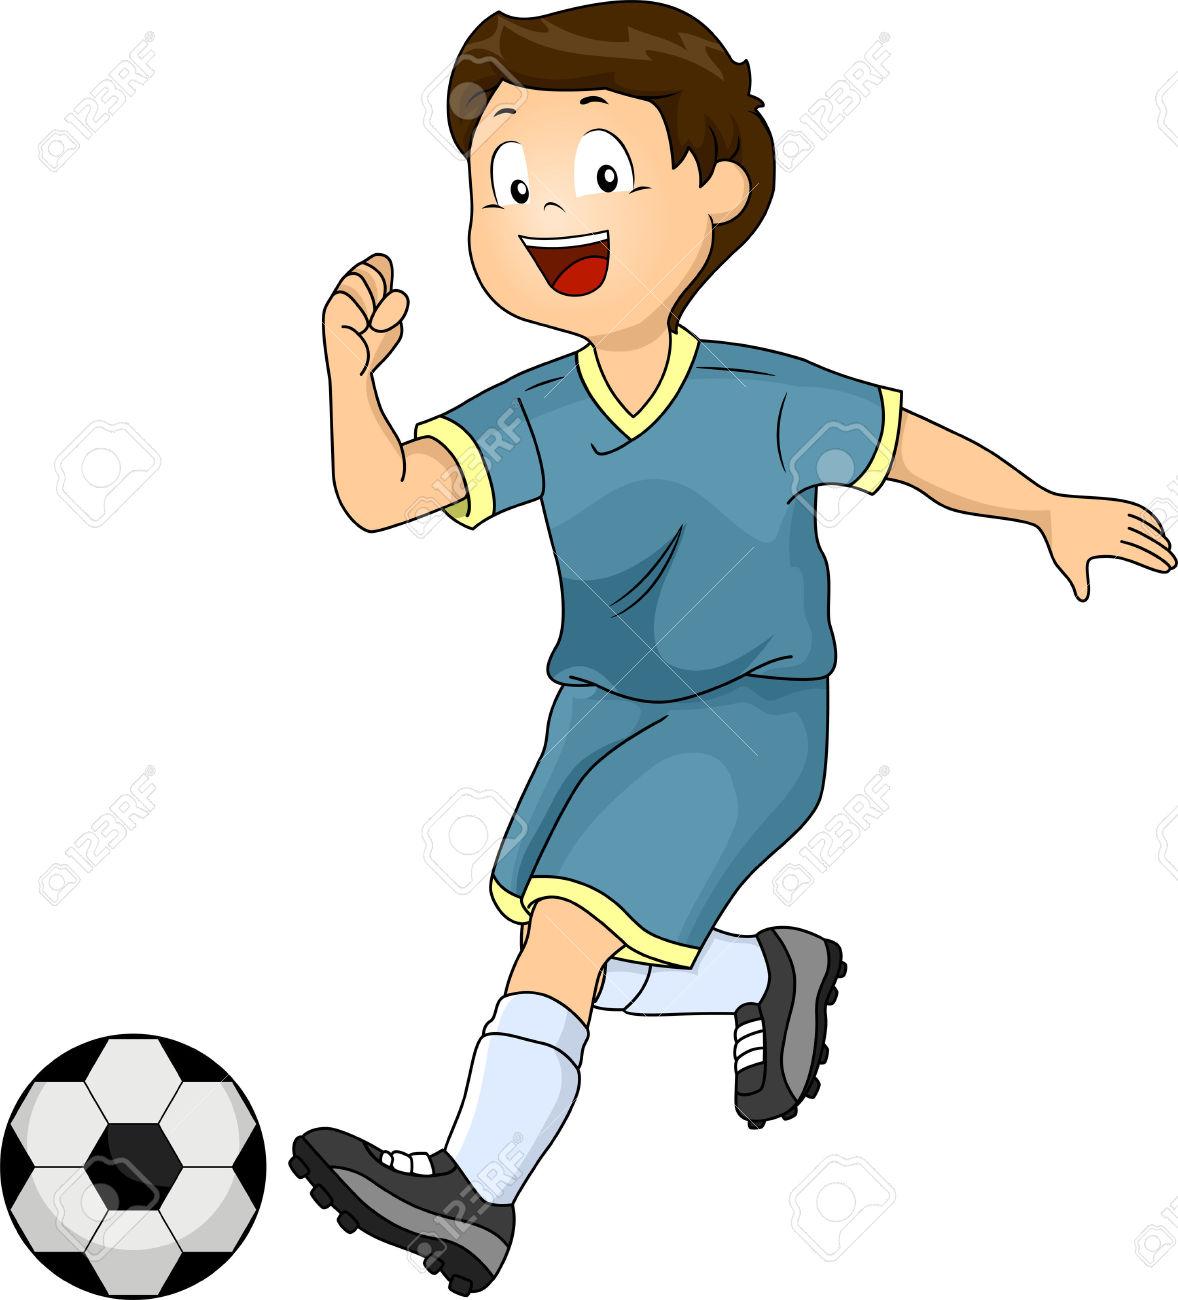 Kicking soccer ball clipart banner royalty free stock kicks baby: boy shooting a soccer ball clipart - Clipground banner royalty free stock